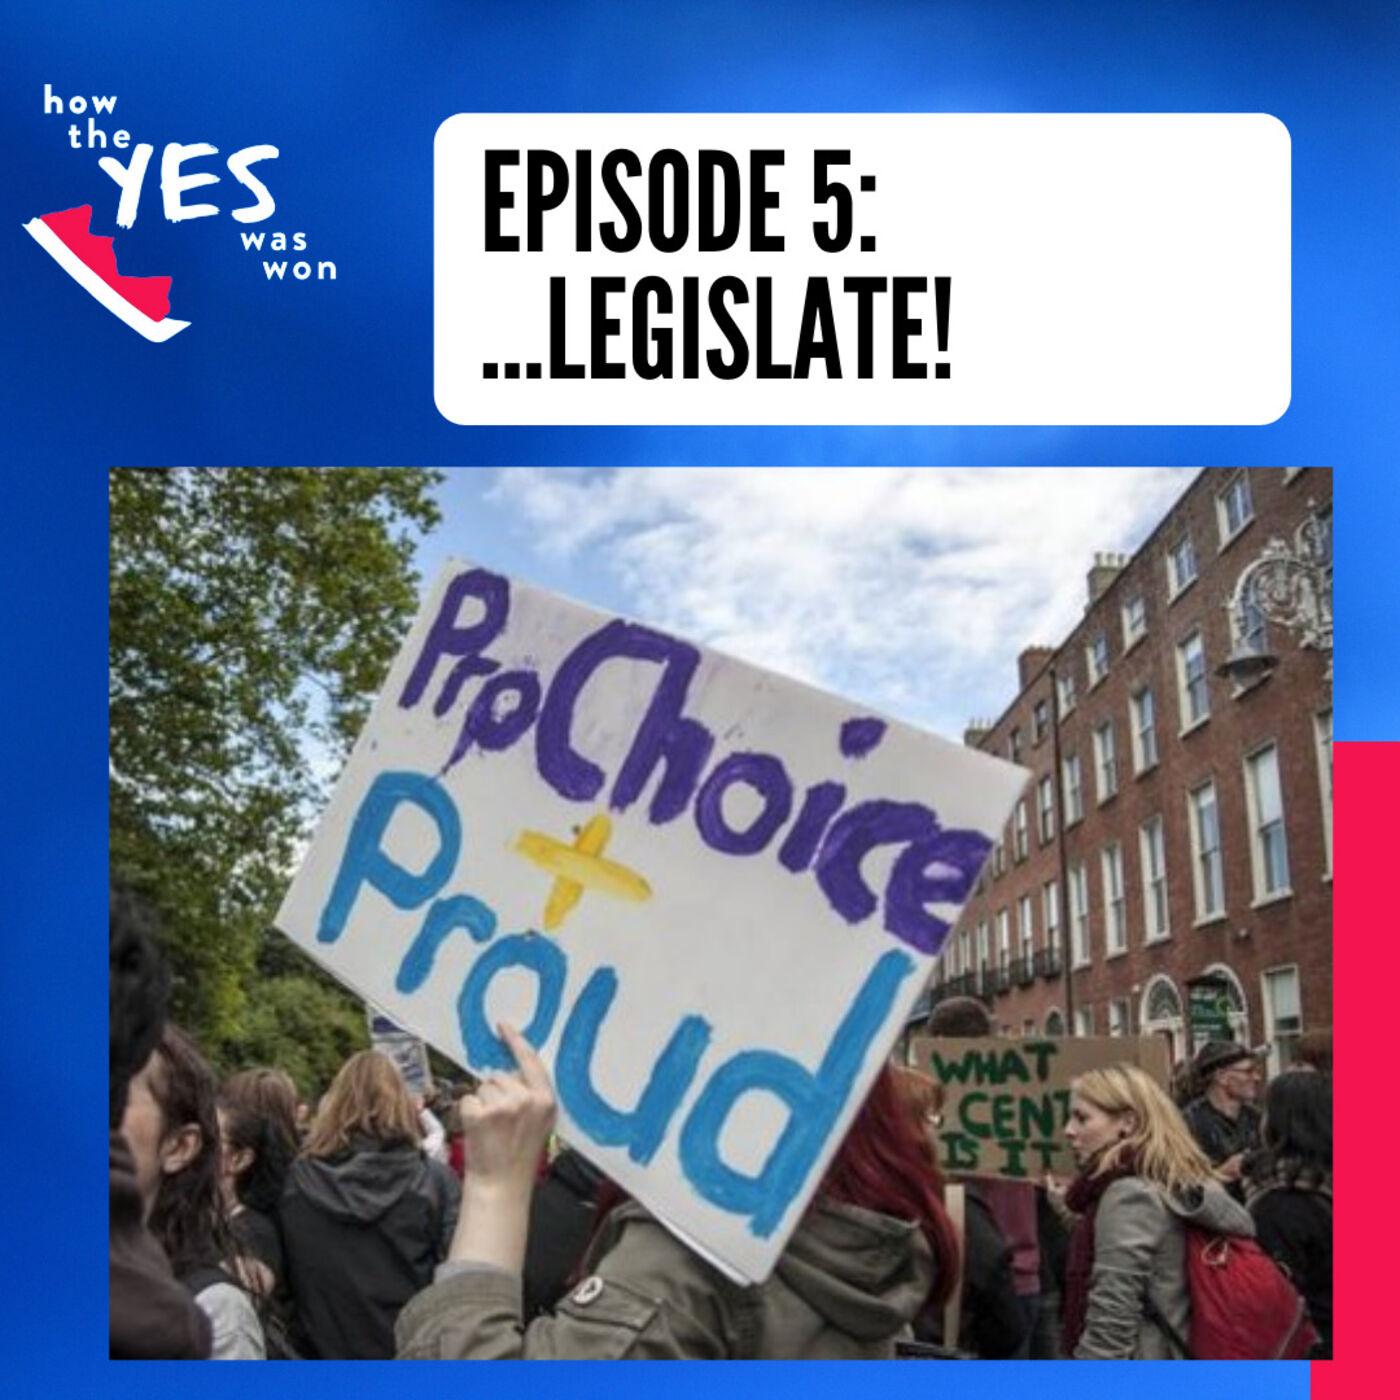 Episode 5: ...Legislate!